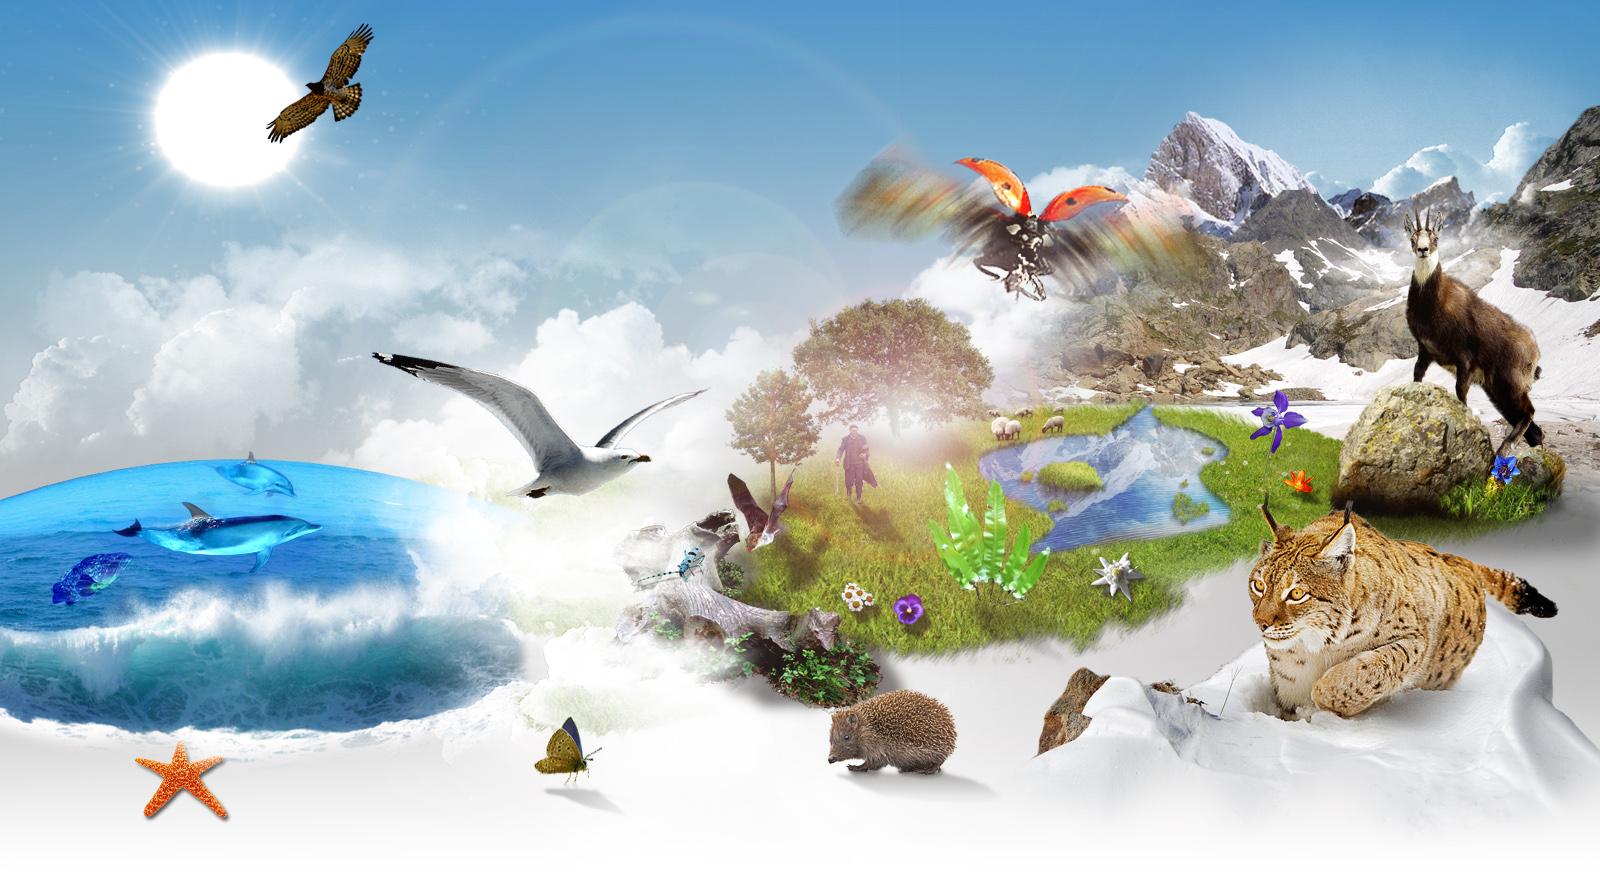 Biodiversité : enjeu environnemental ou politique ?